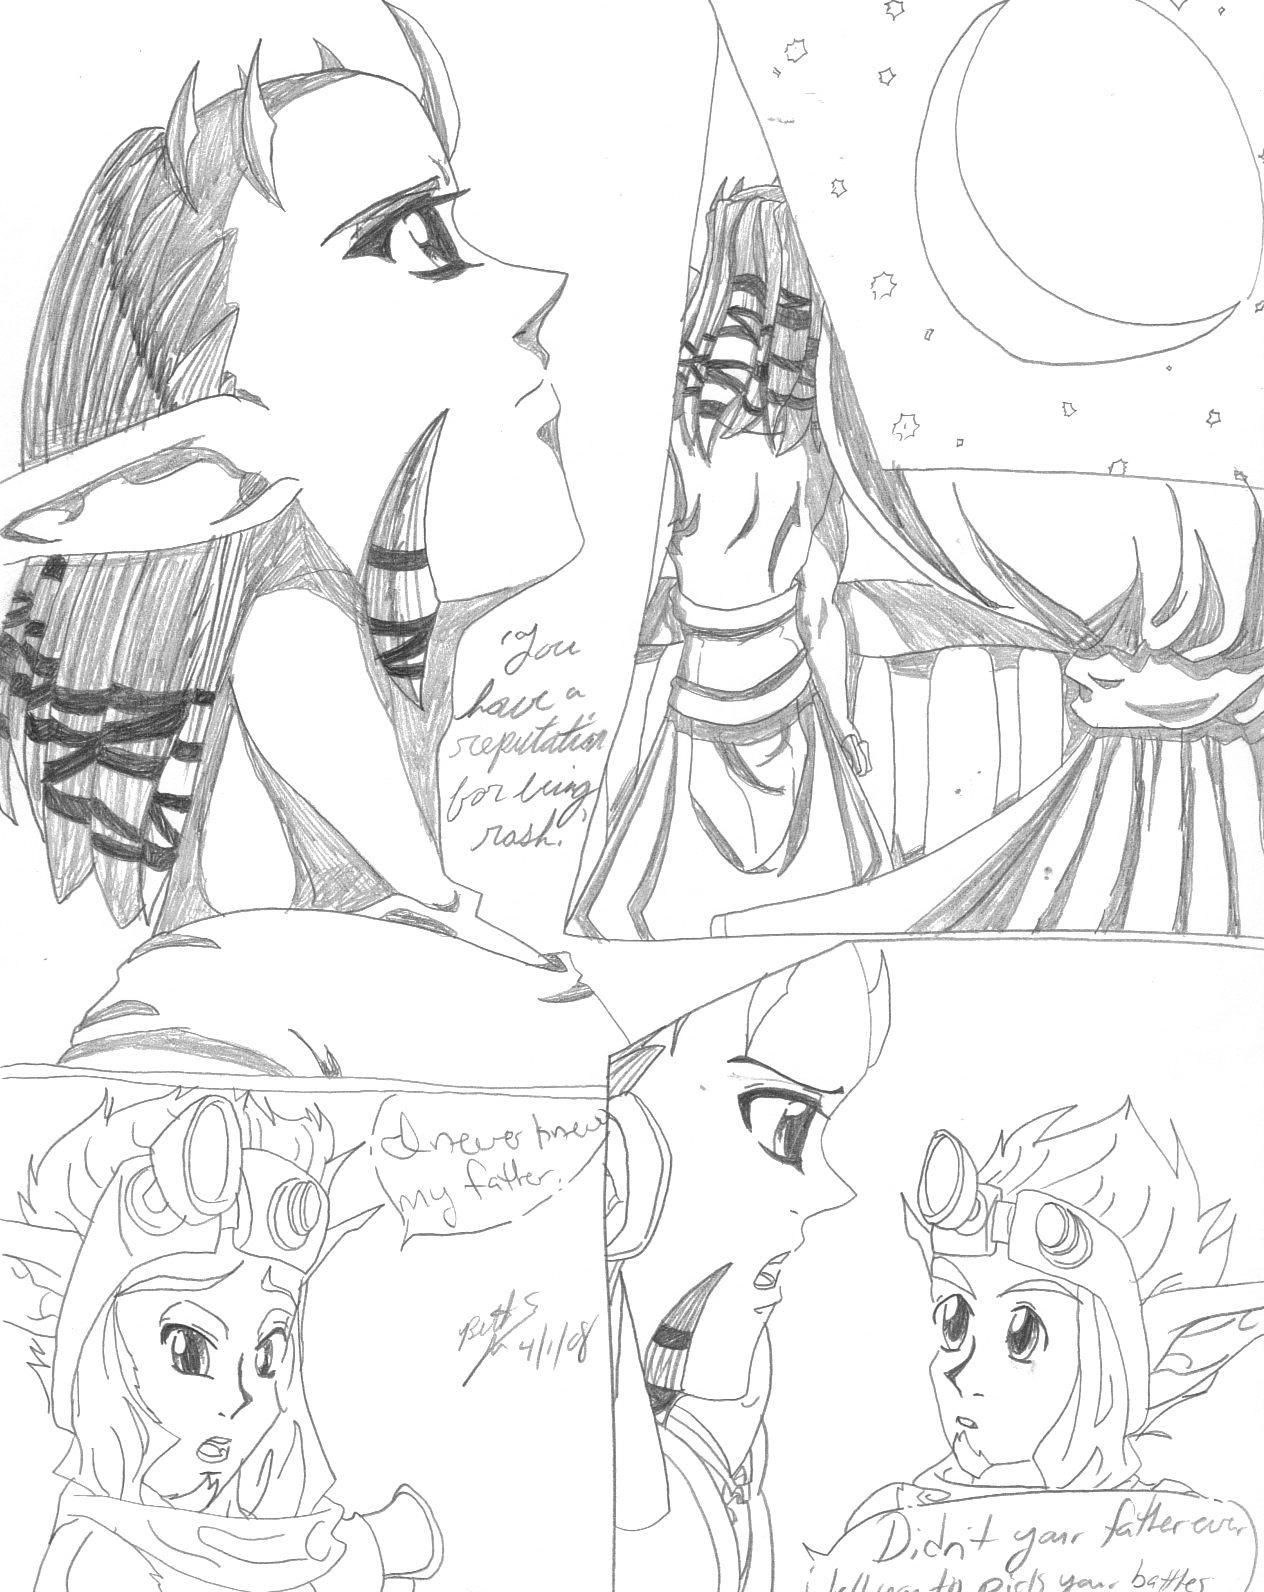 Manga sample page of Jak and Damas by ThebSayraduka